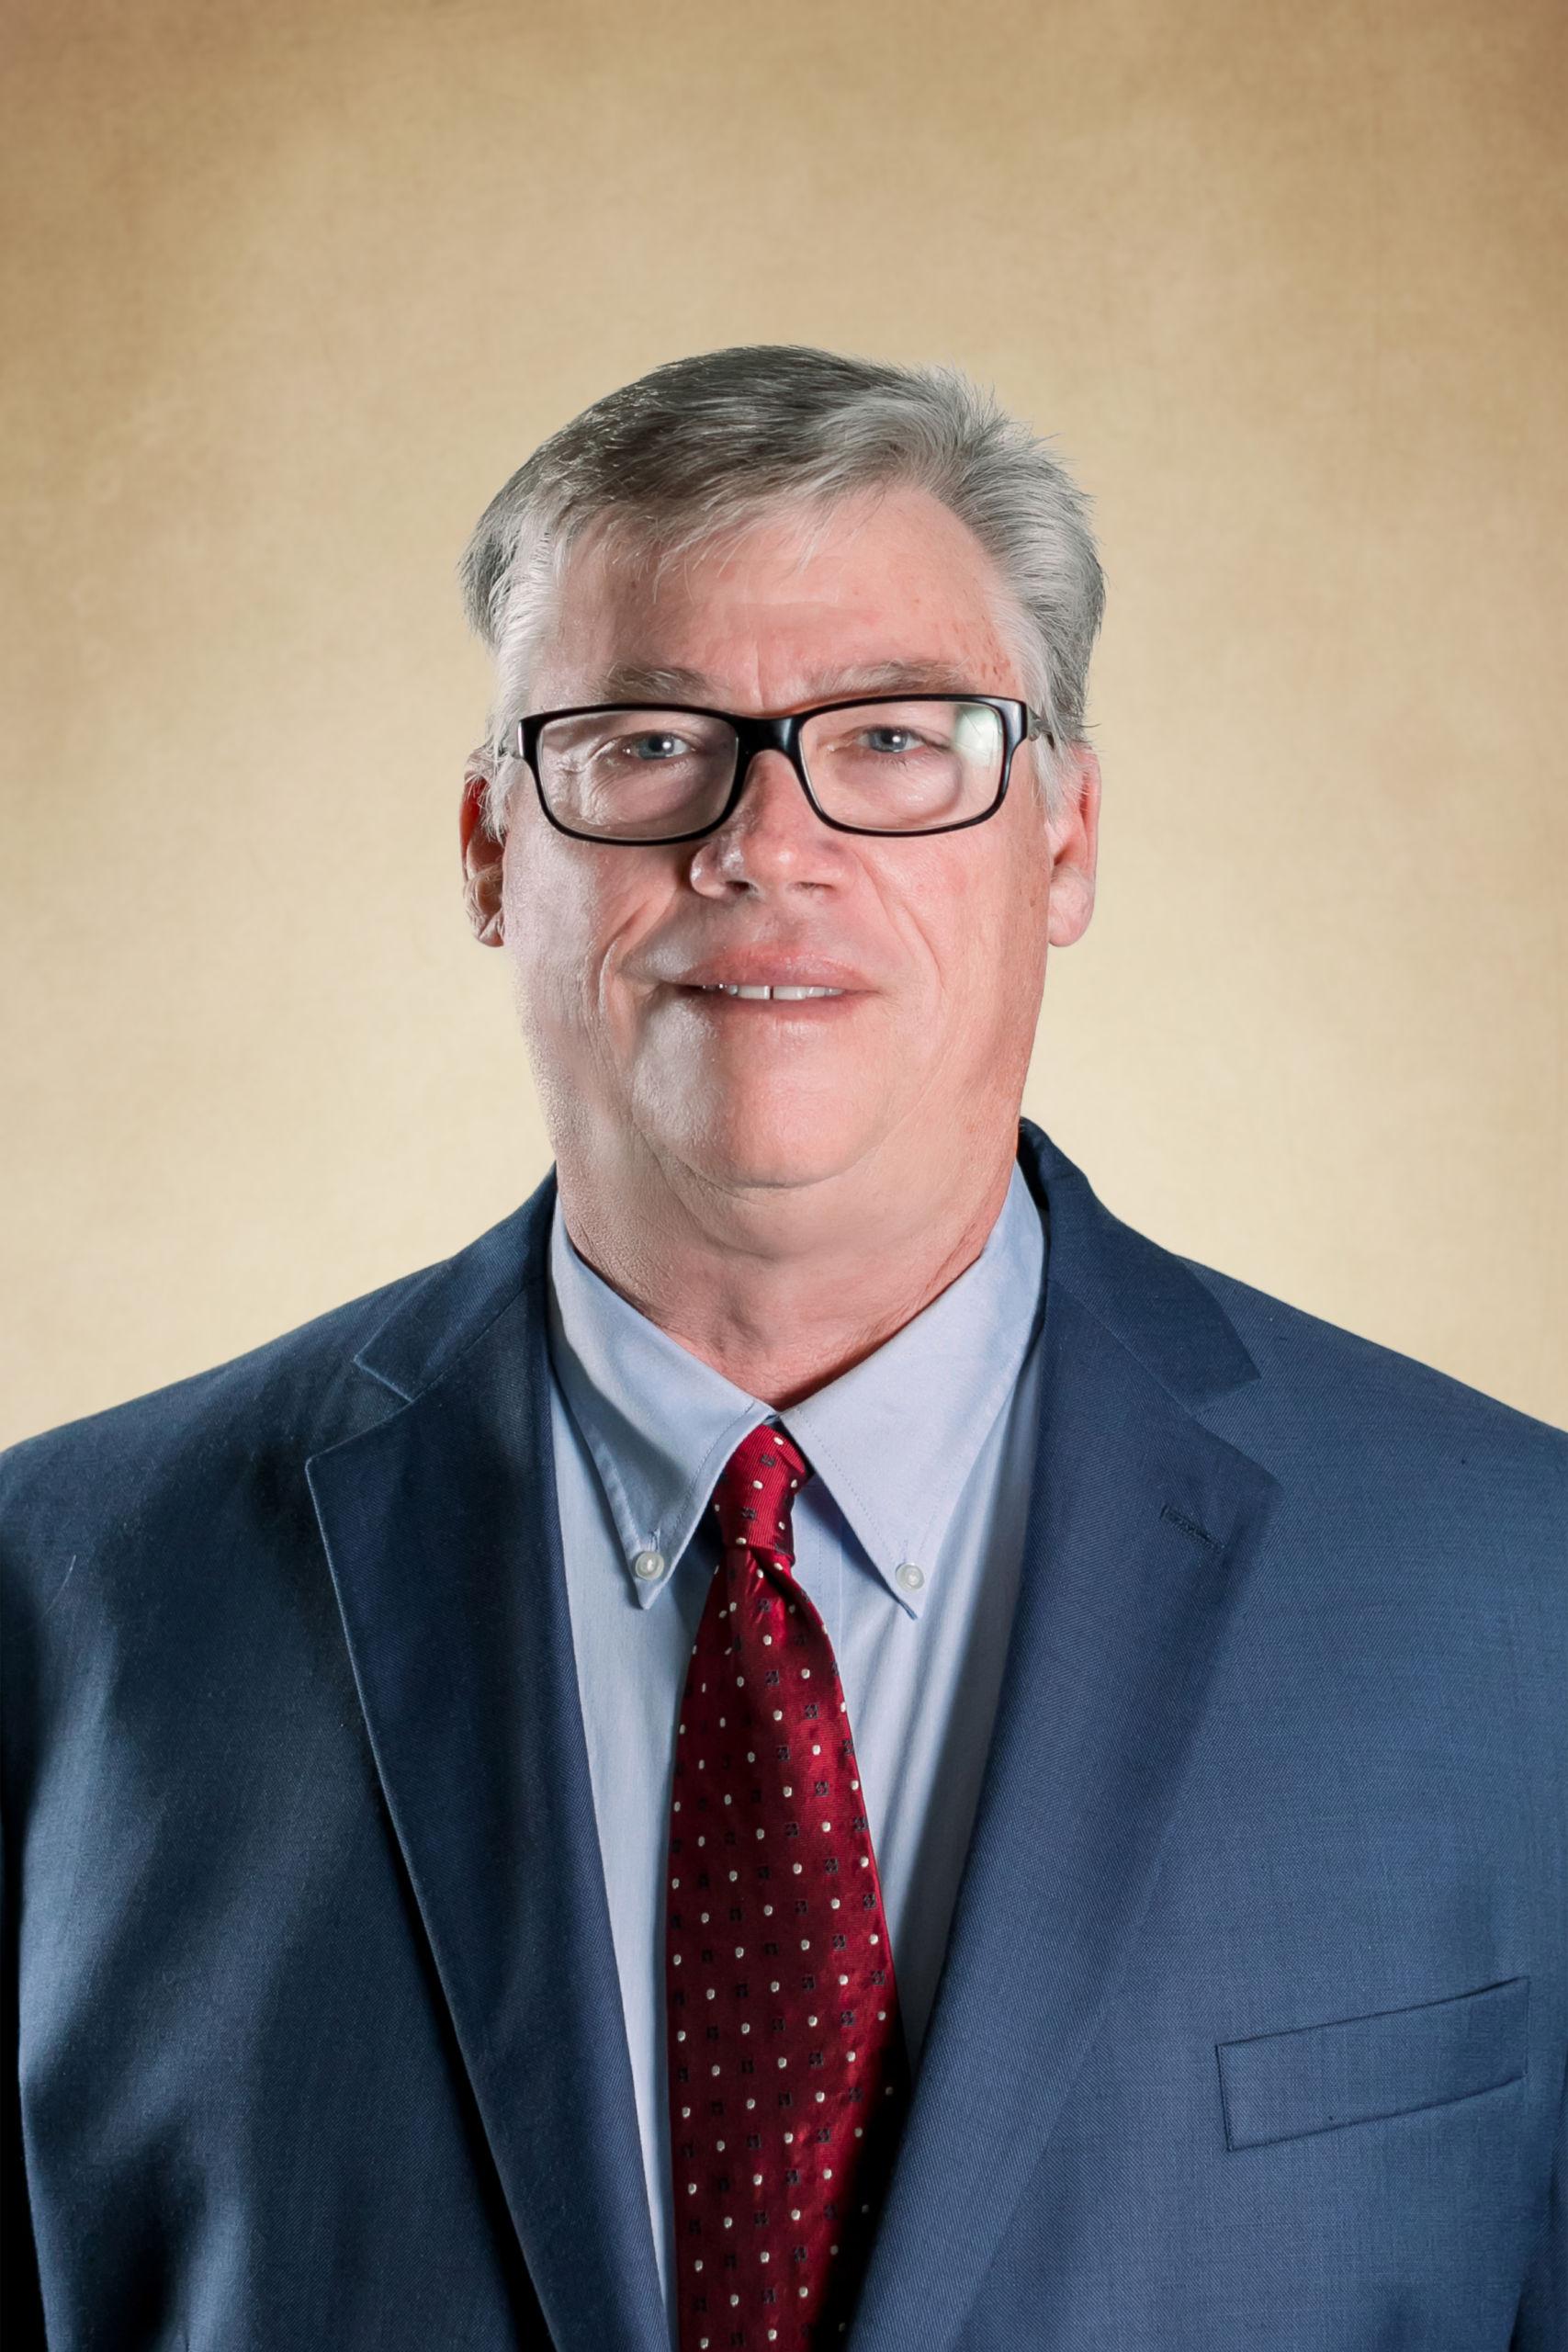 Dr. John Huysman